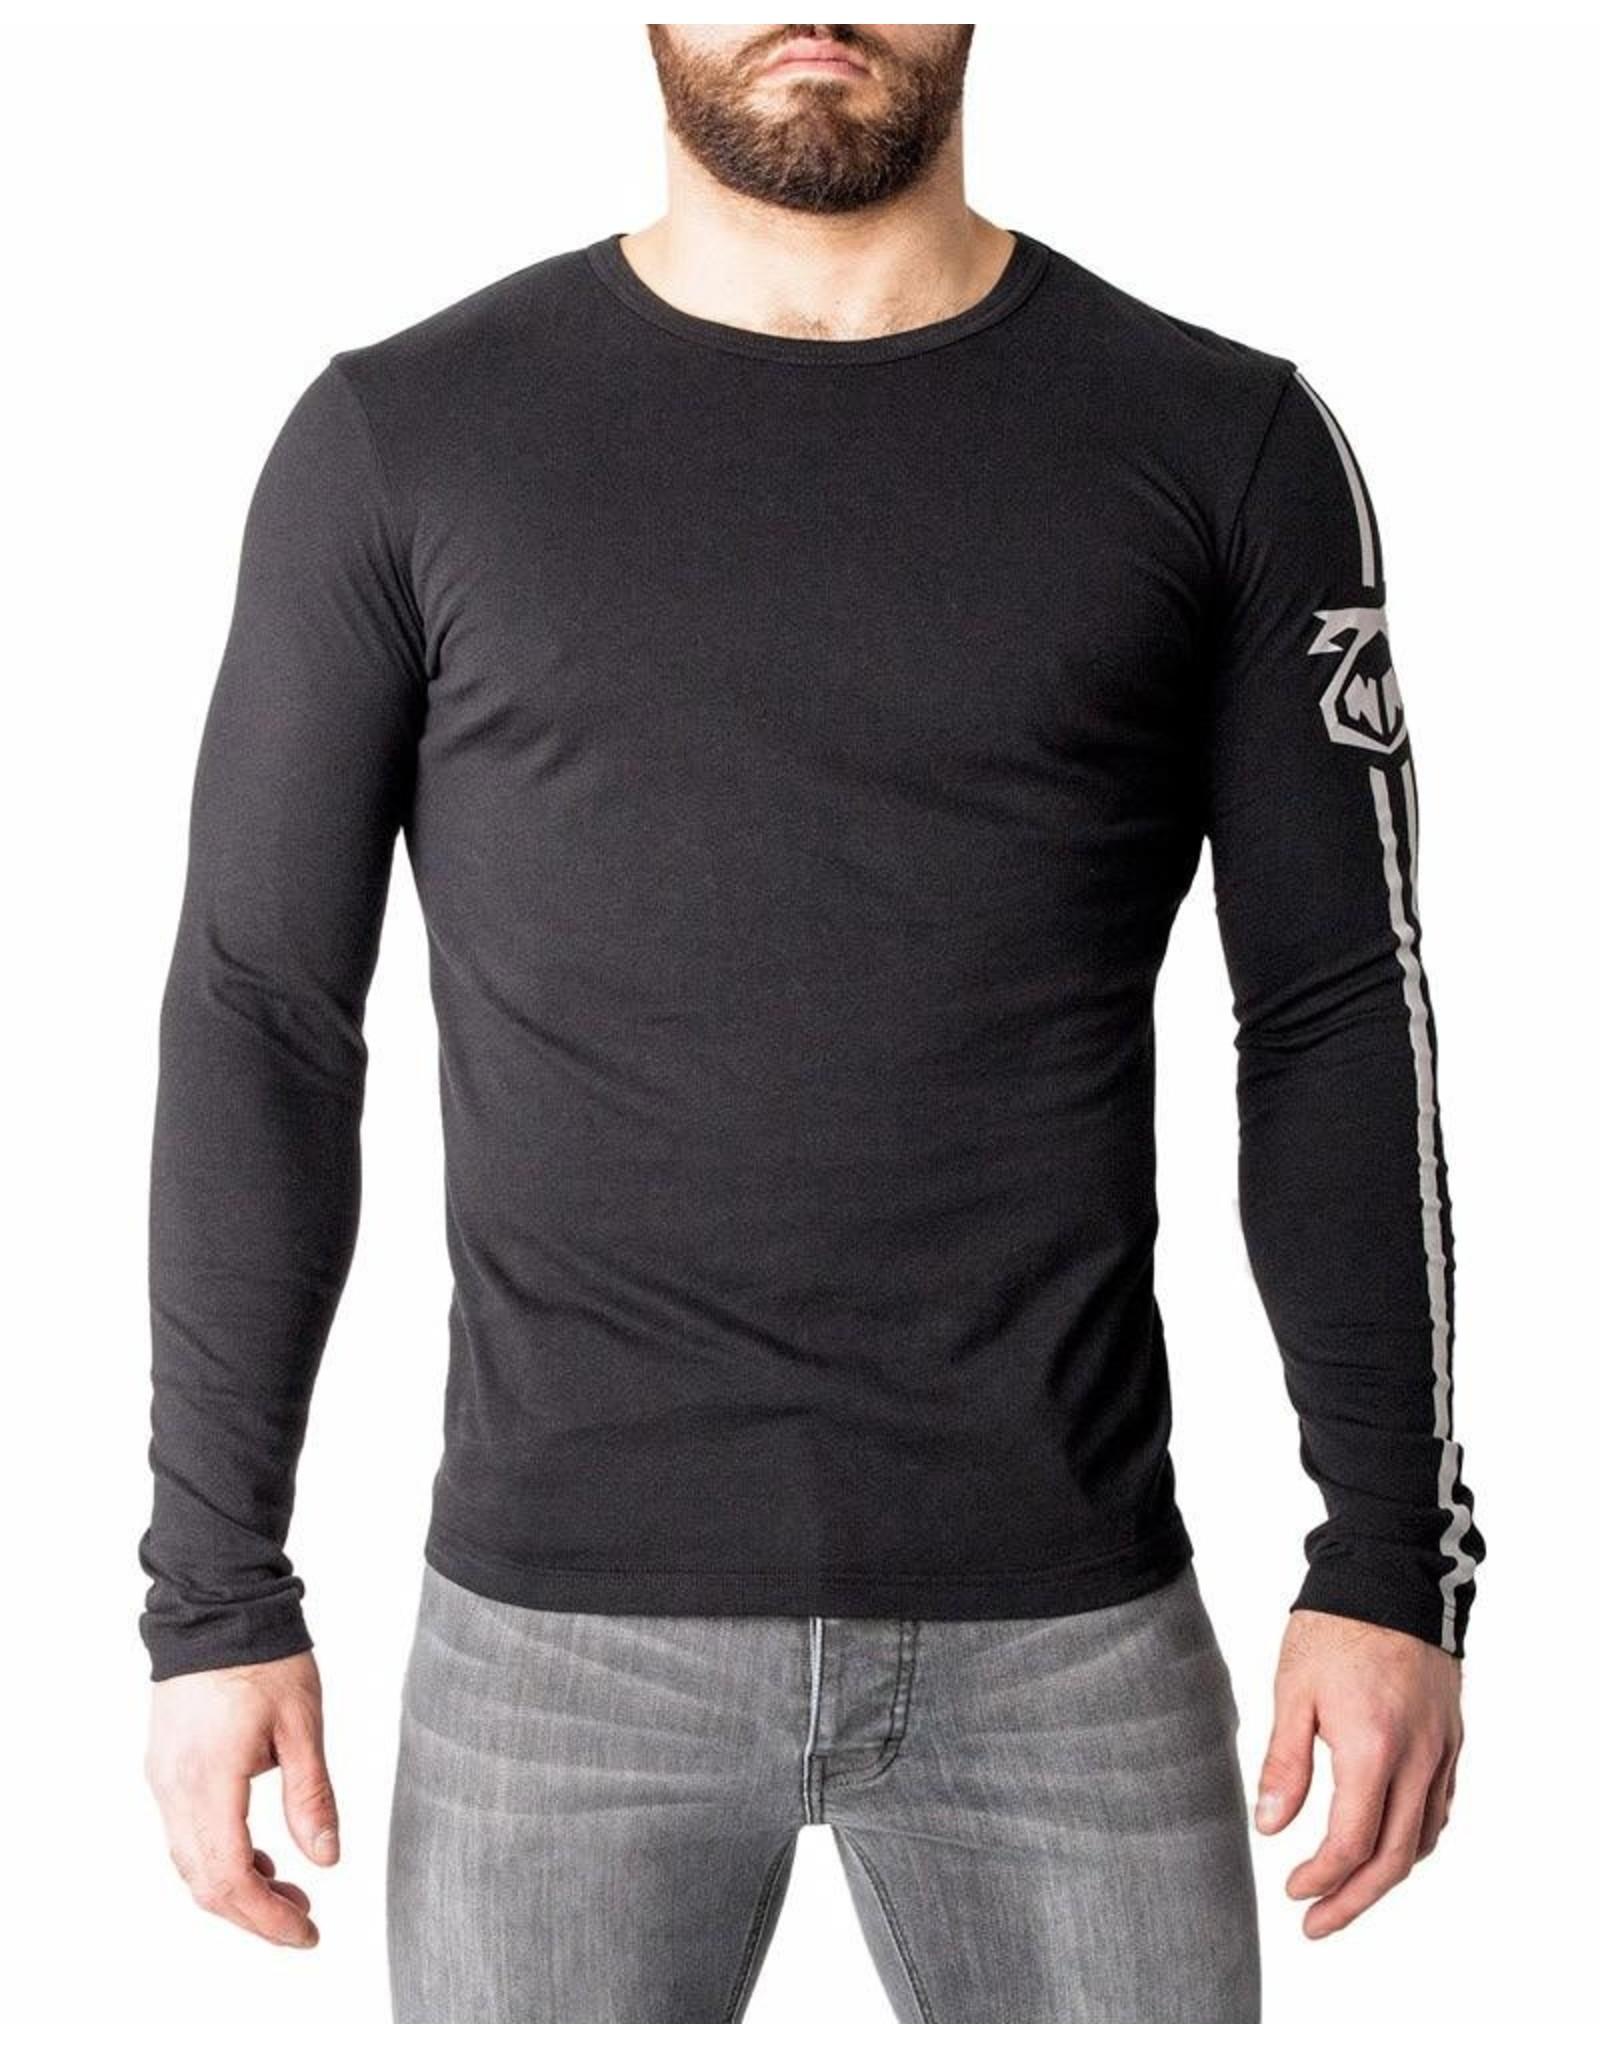 Nasty Pig Nasty Pig Racer Long Sleeve Shirt